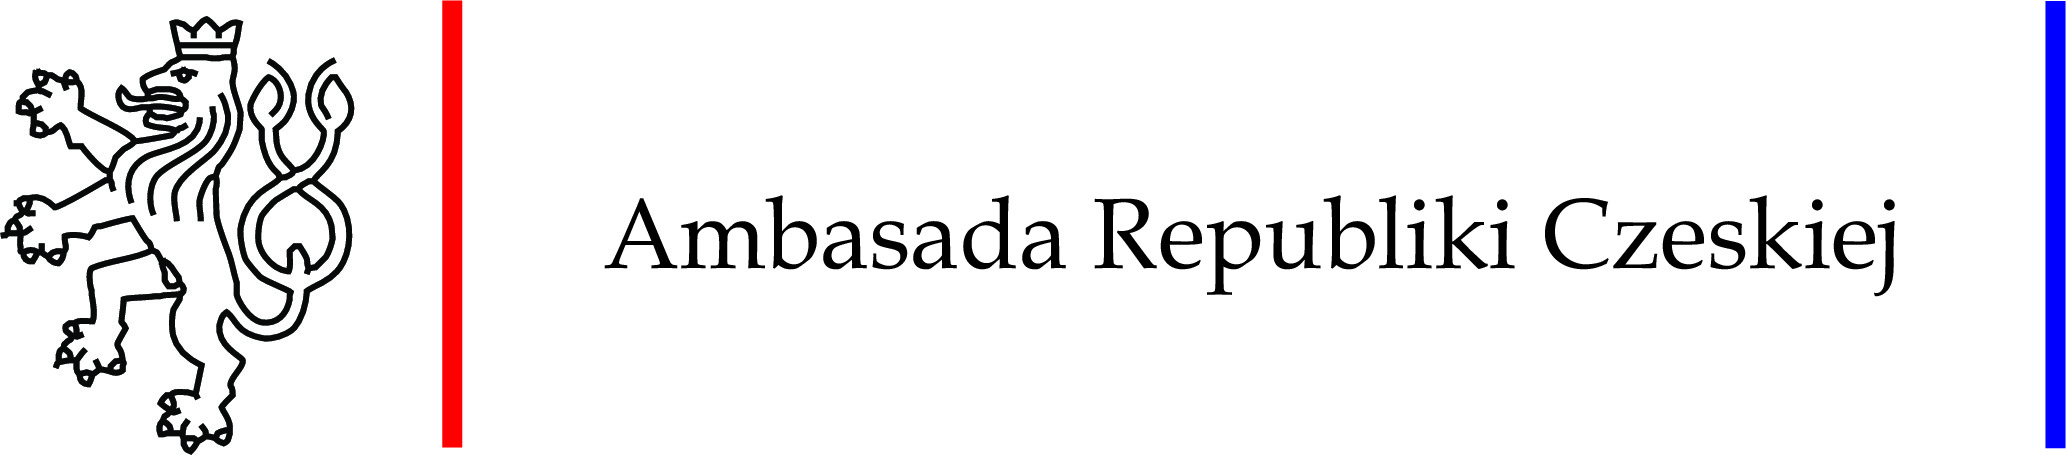 Logo_Ambasada_Czeska